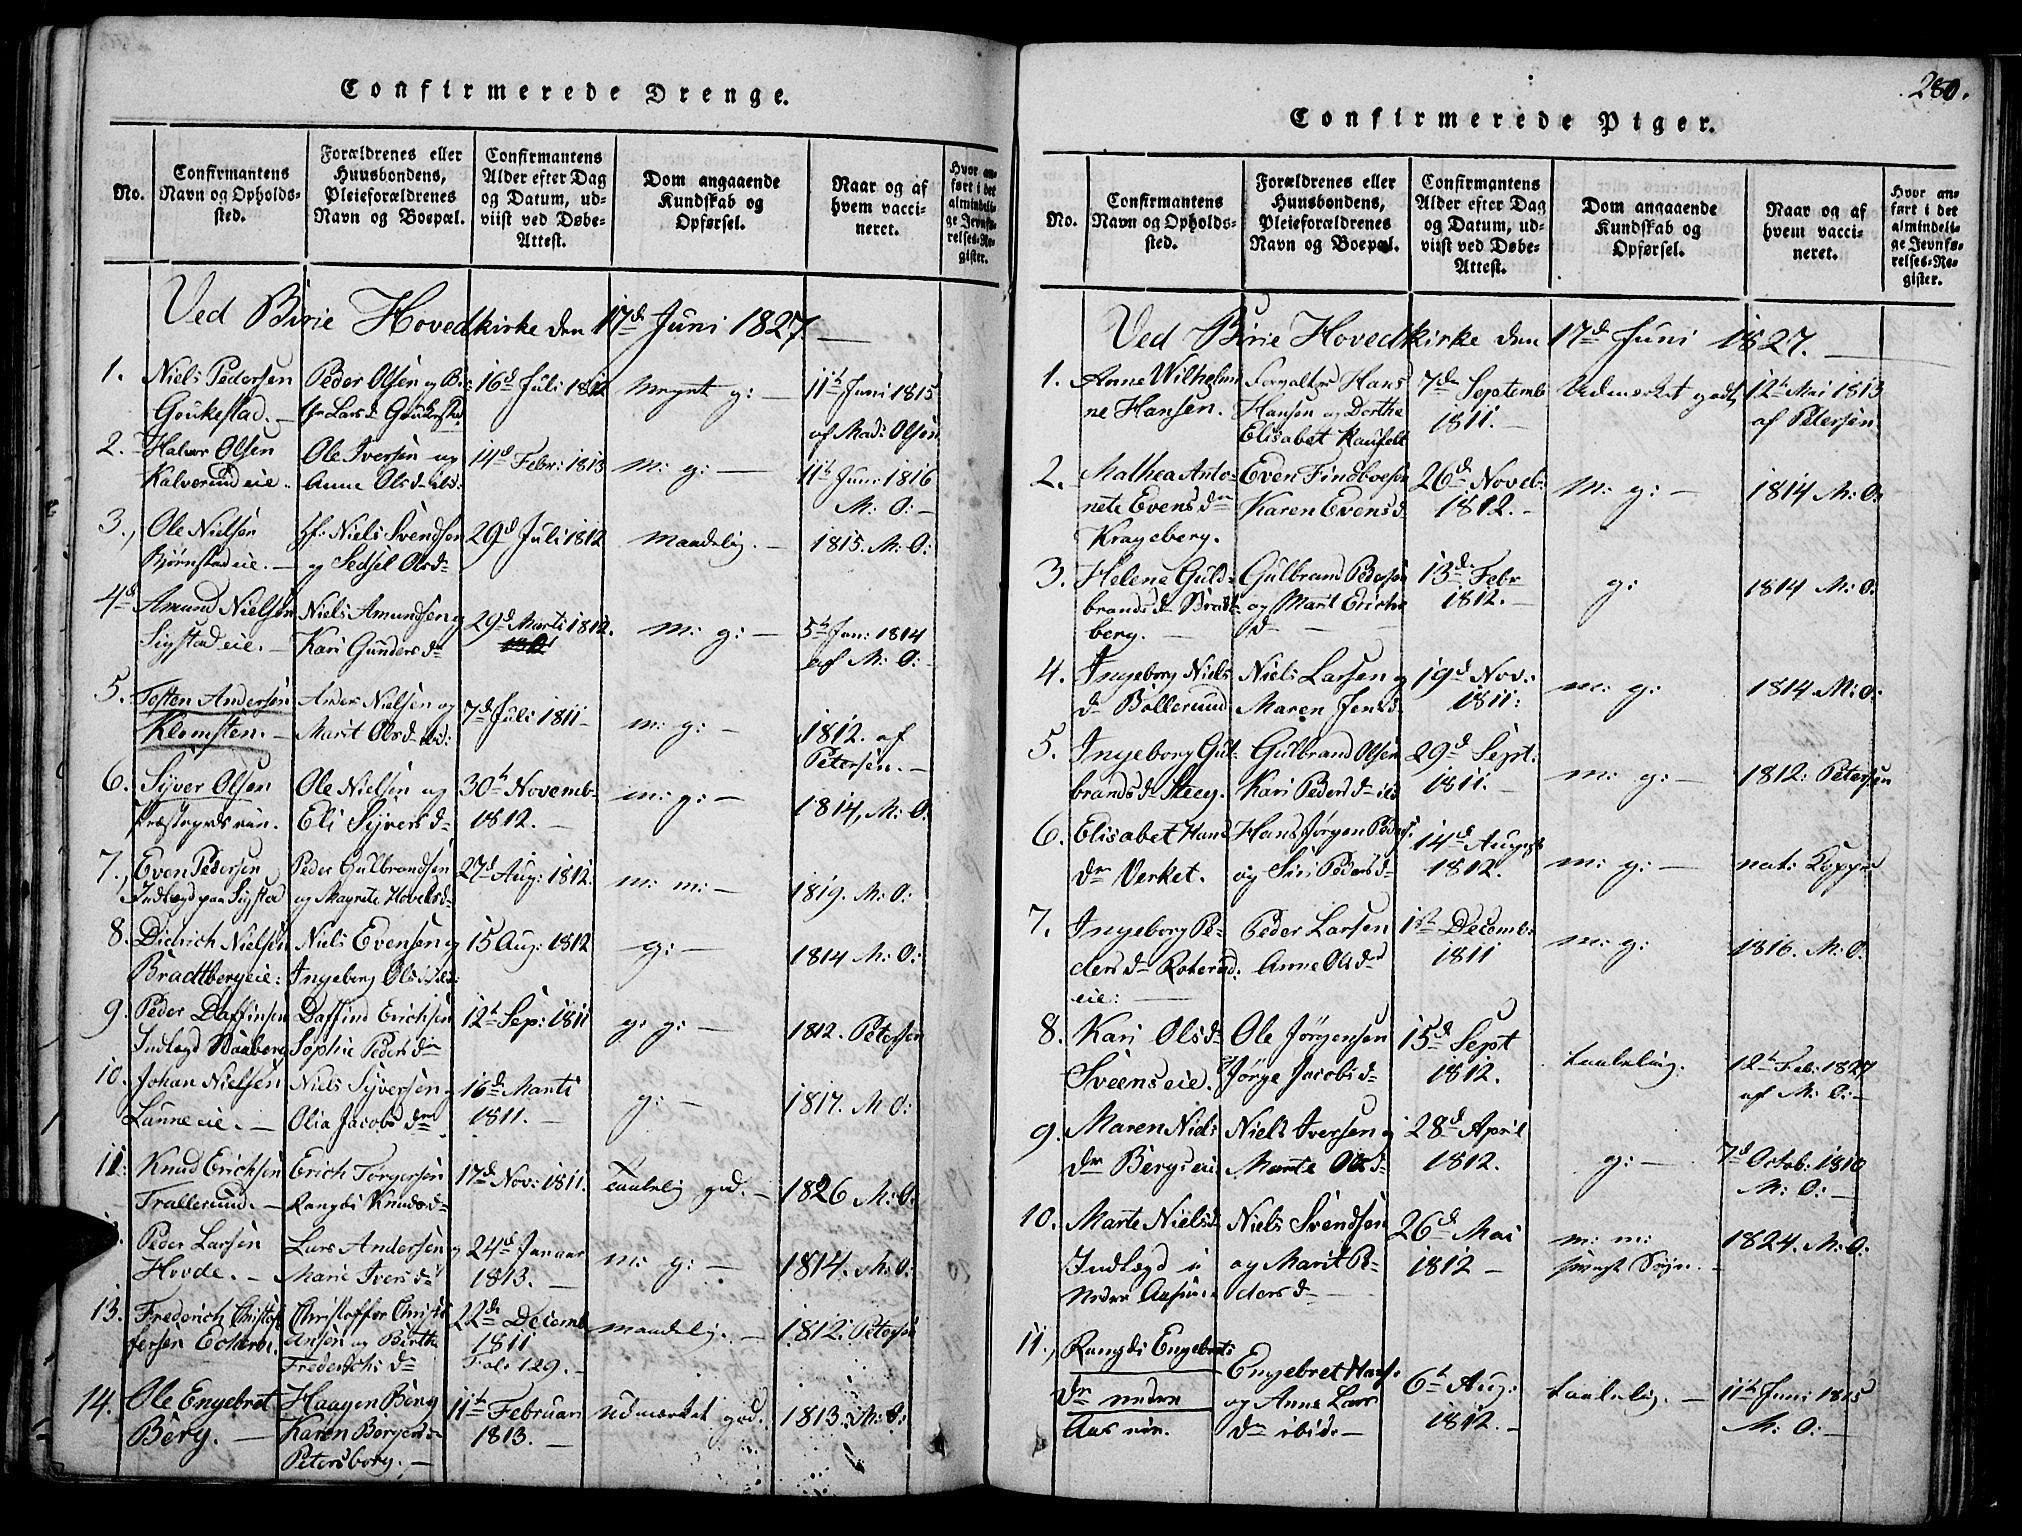 SAH, Biri prestekontor, Ministerialbok nr. 3, 1814-1828, s. 280